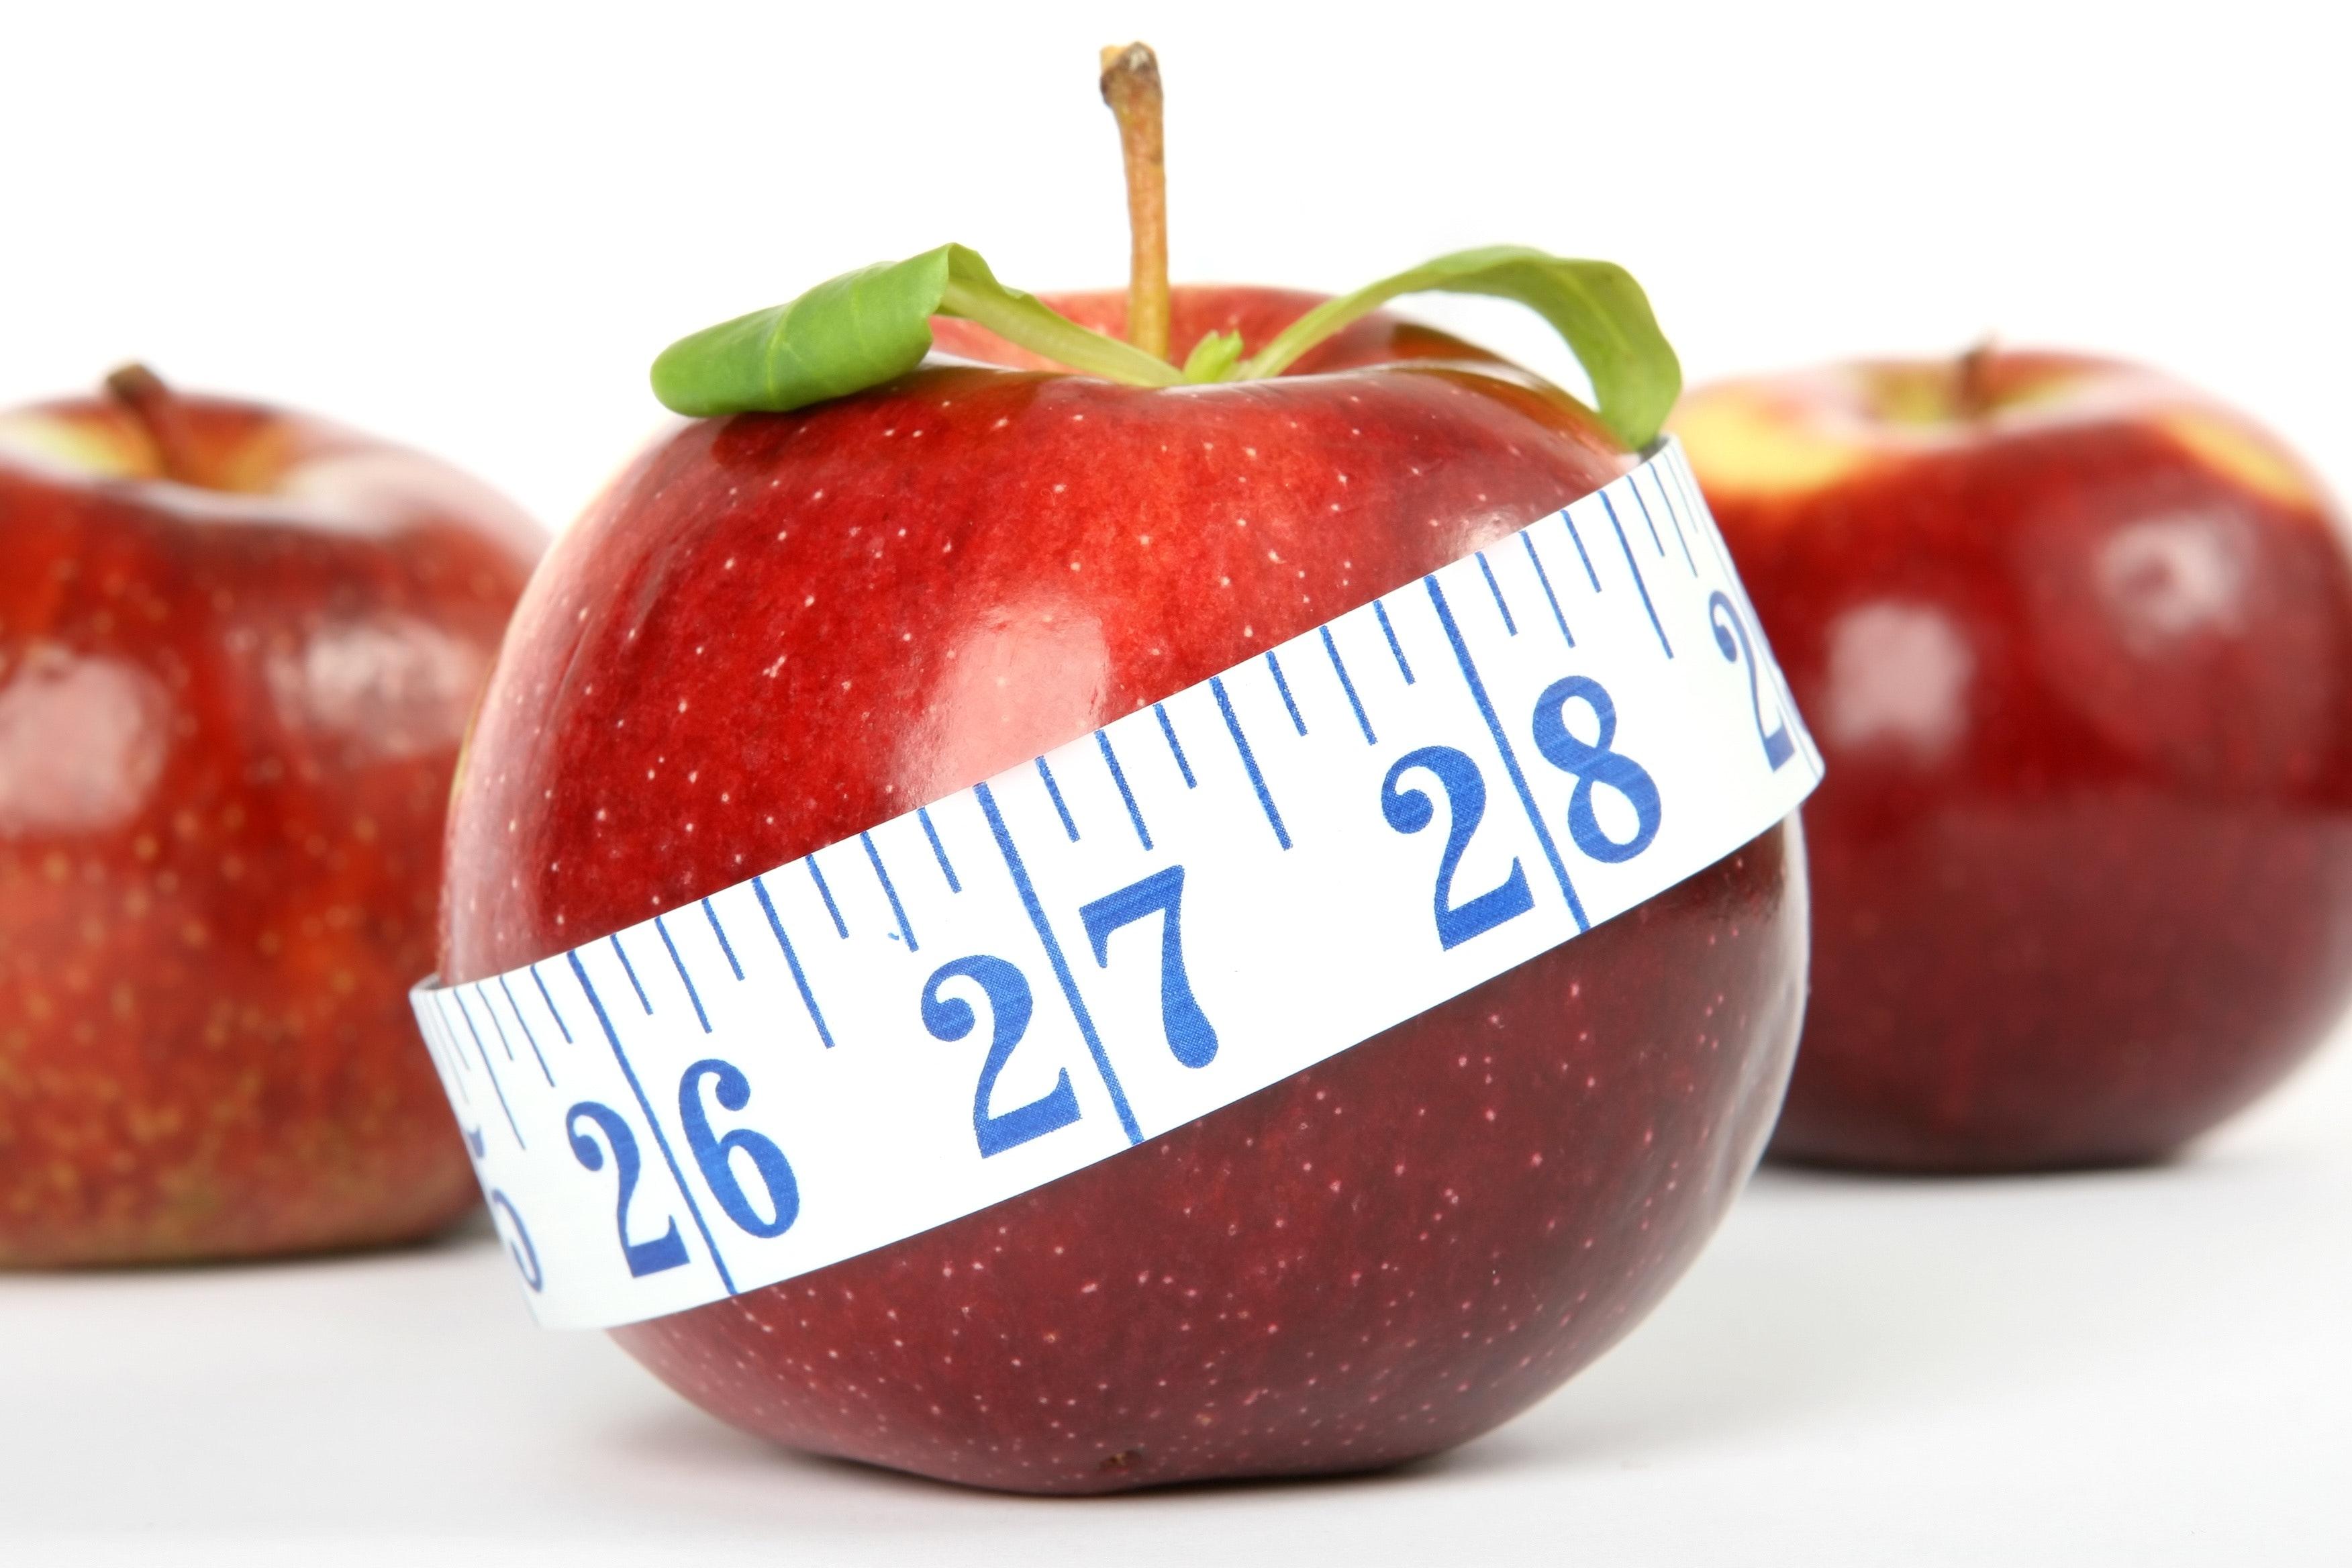 Cum sa fii supla - sfatulparintilor.ro - pexels_com - appetite-apple-close-up-262876